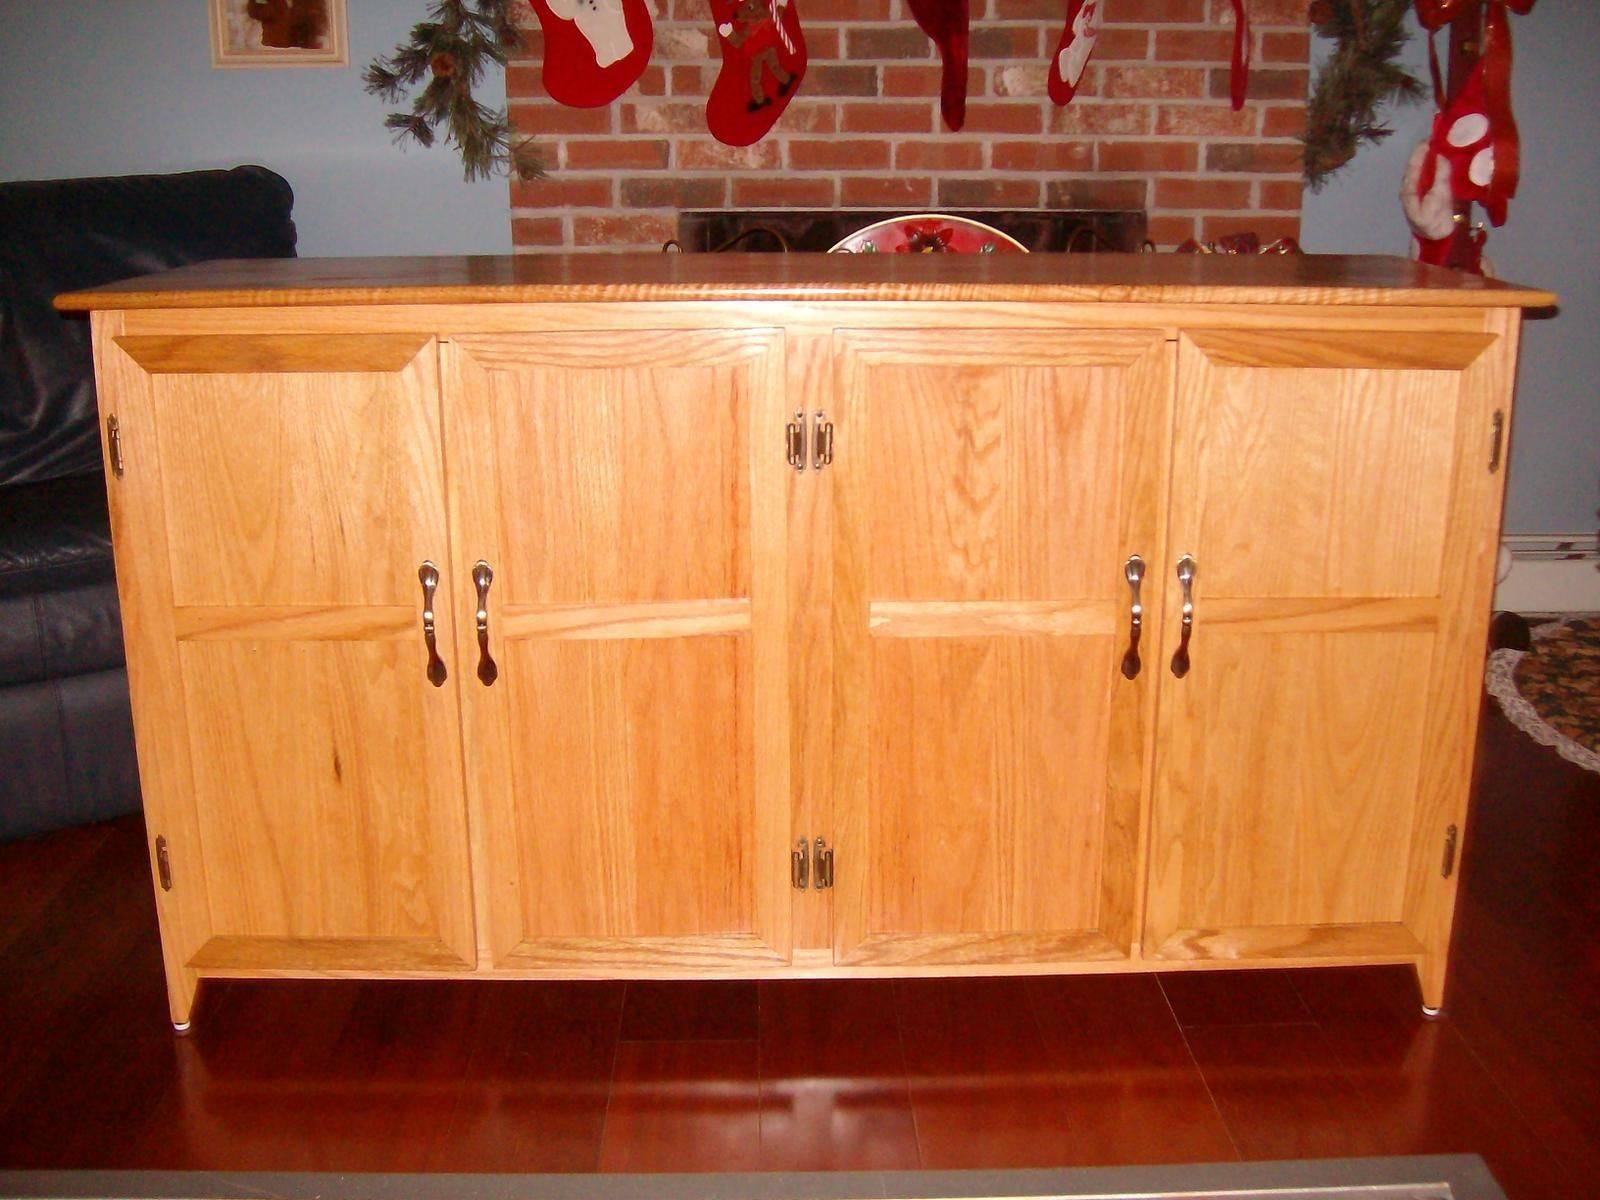 Custom Made Red Oak Kitchen Sideboardduczynski Woodworking Inside Kitchen Sideboard (#4 of 20)